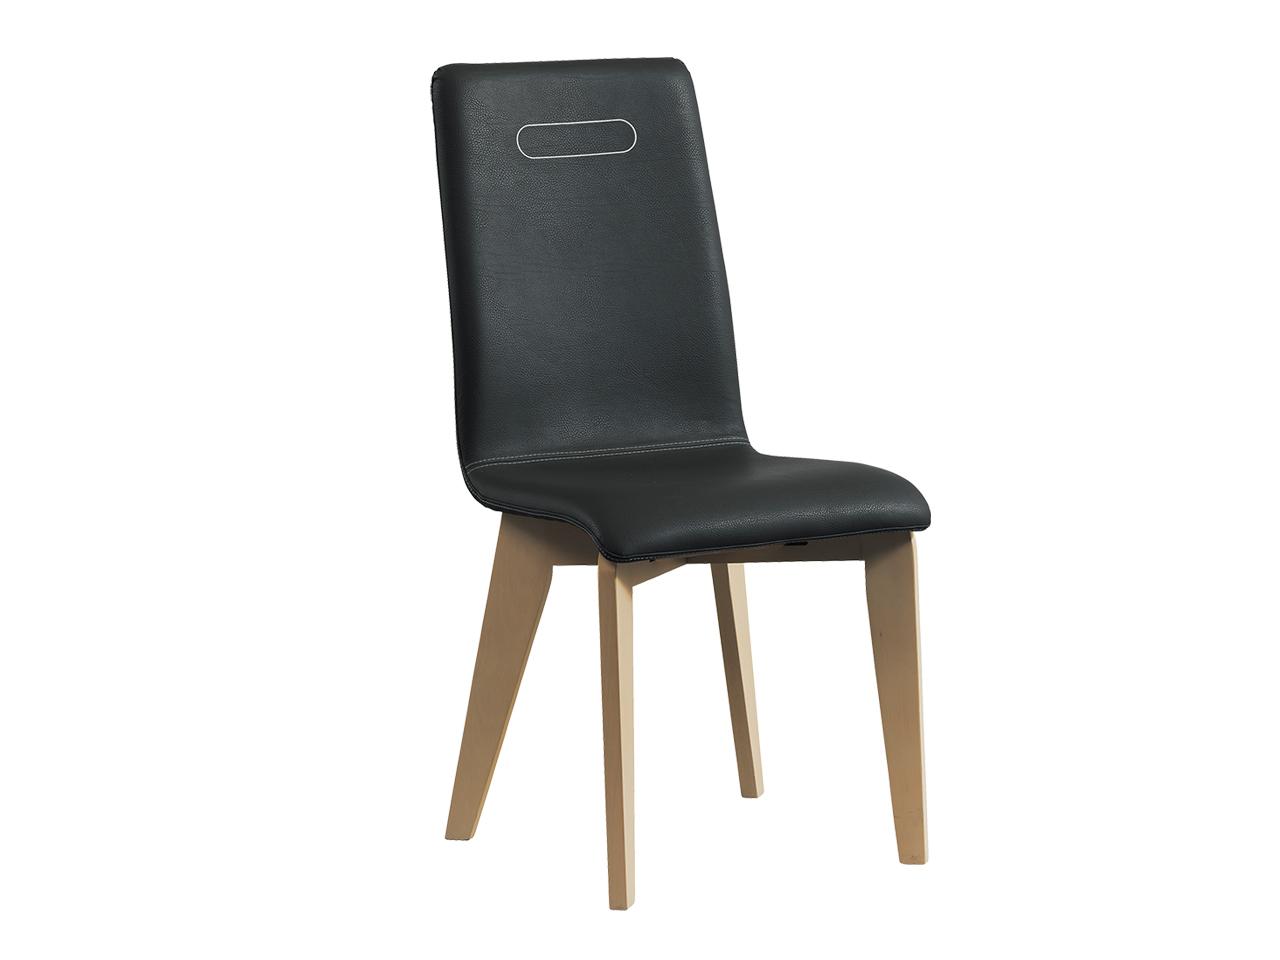 lot de 2 chaises himalaya cuir gris naturel meubles minet. Black Bedroom Furniture Sets. Home Design Ideas